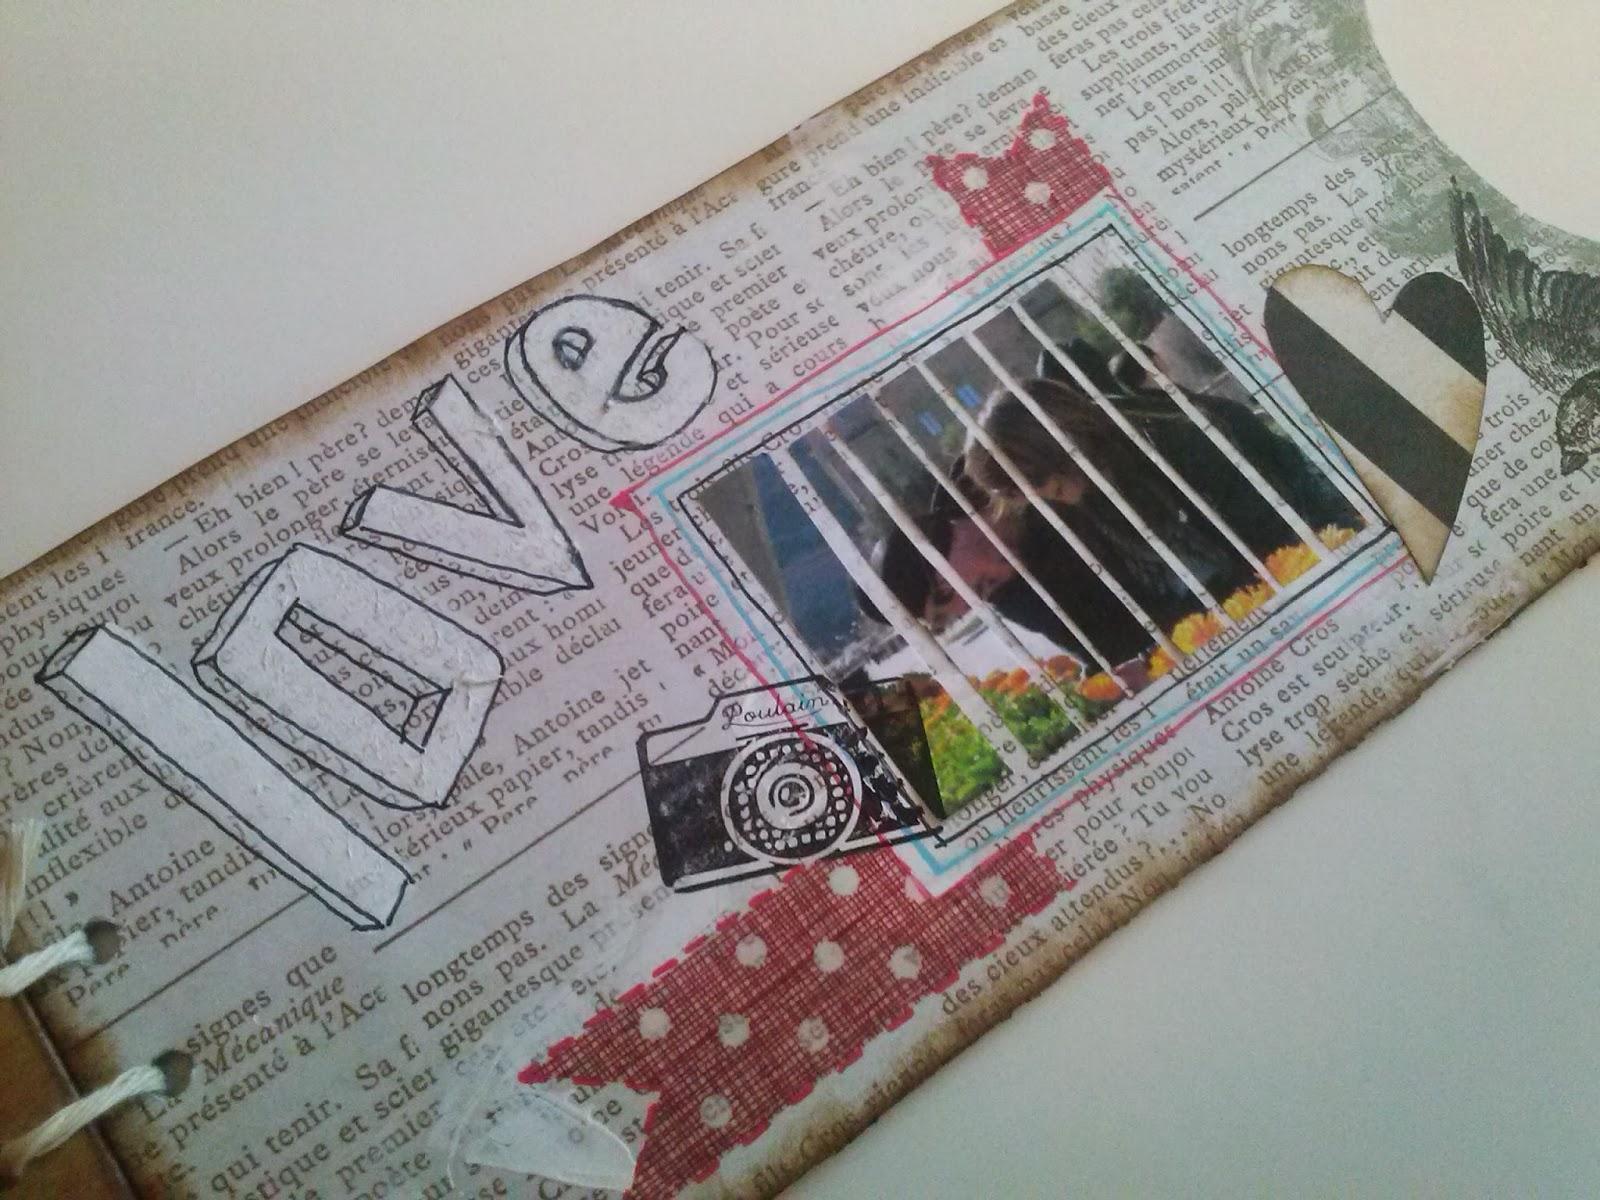 Rosa gomez lbum amor - Decoracion de album de fotos ...